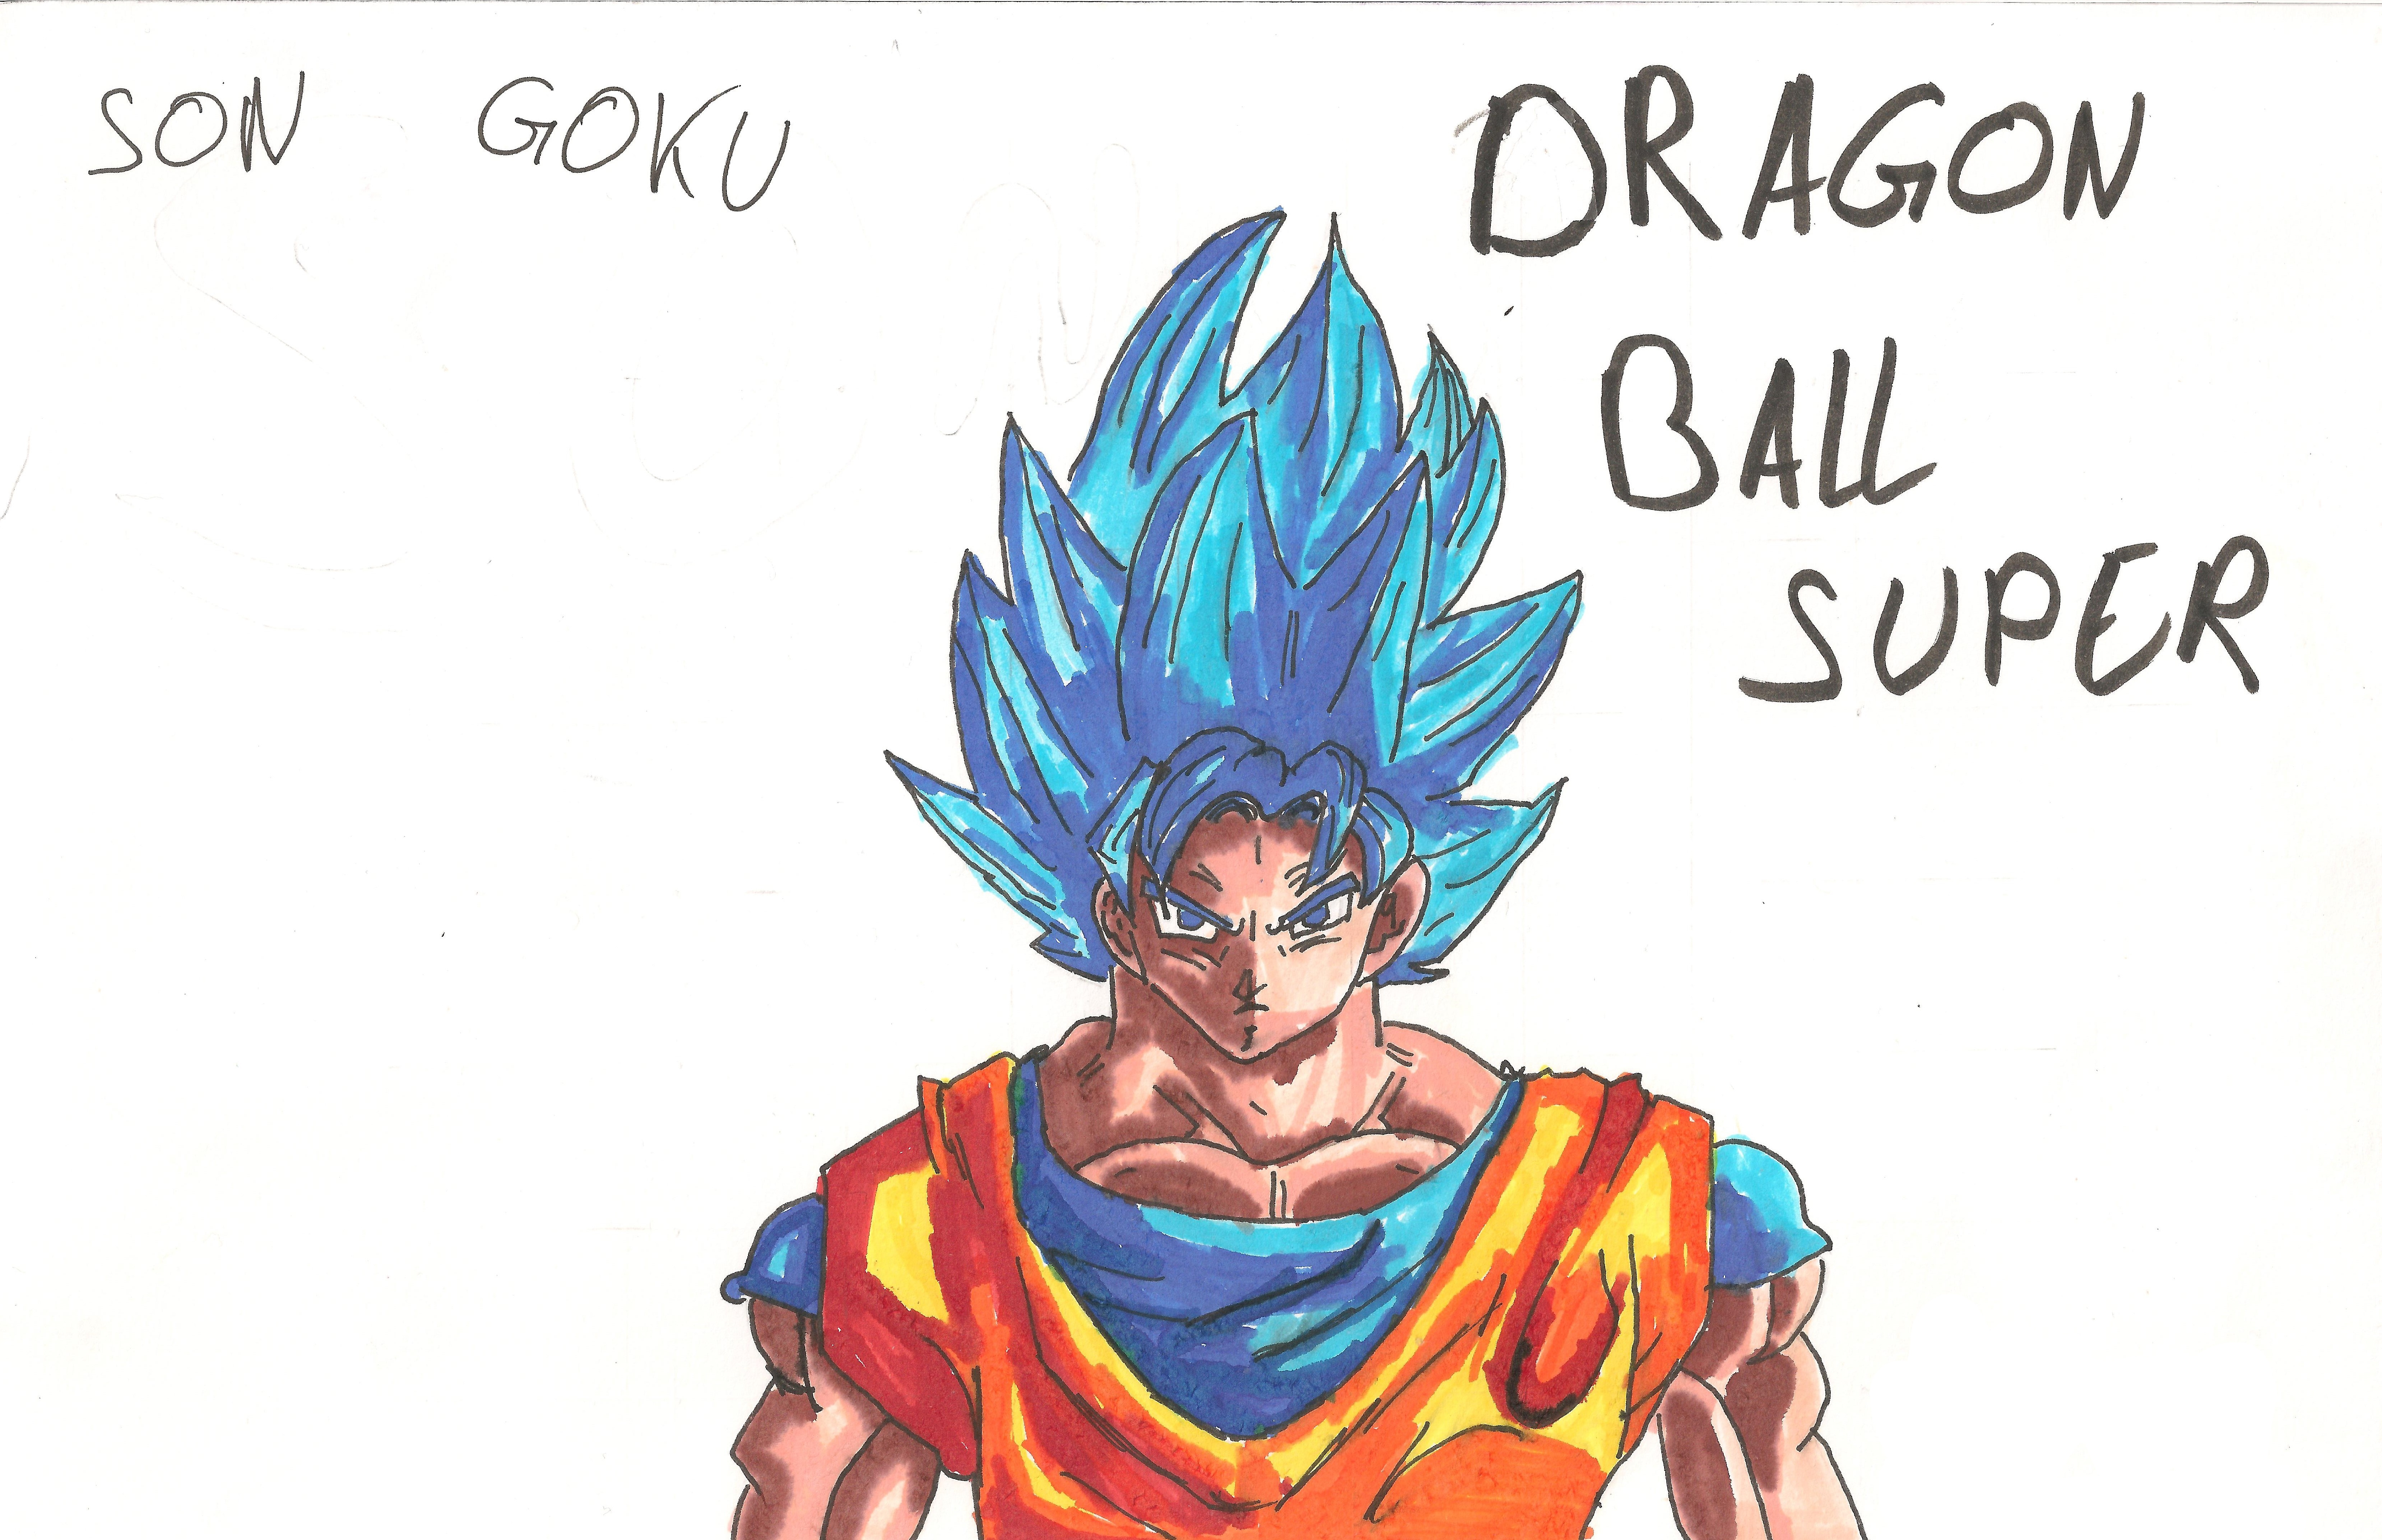 Dessin Son Goku super saiyan blue de Kizla